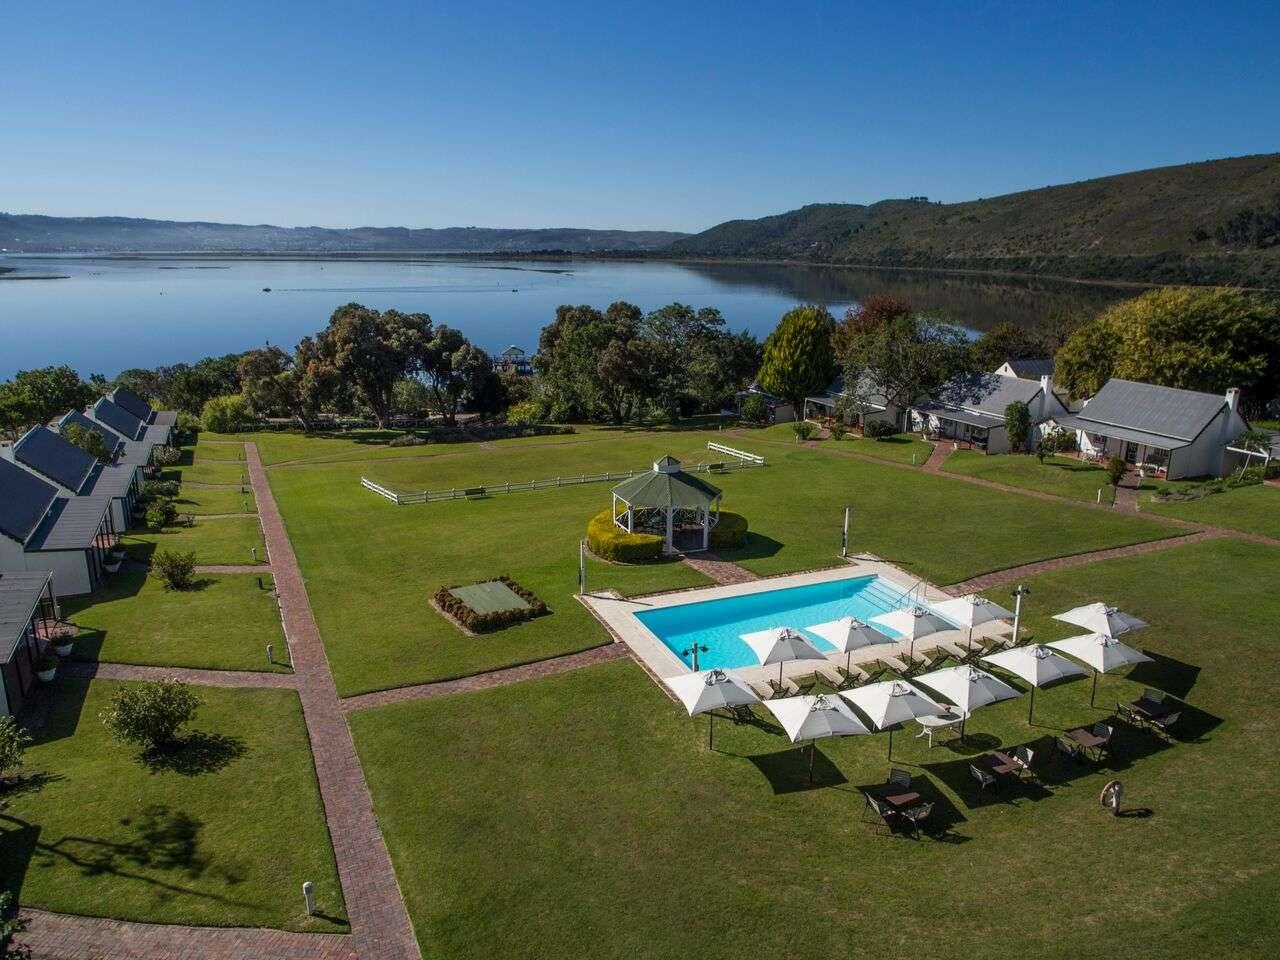 Hotel Knysna South Africa